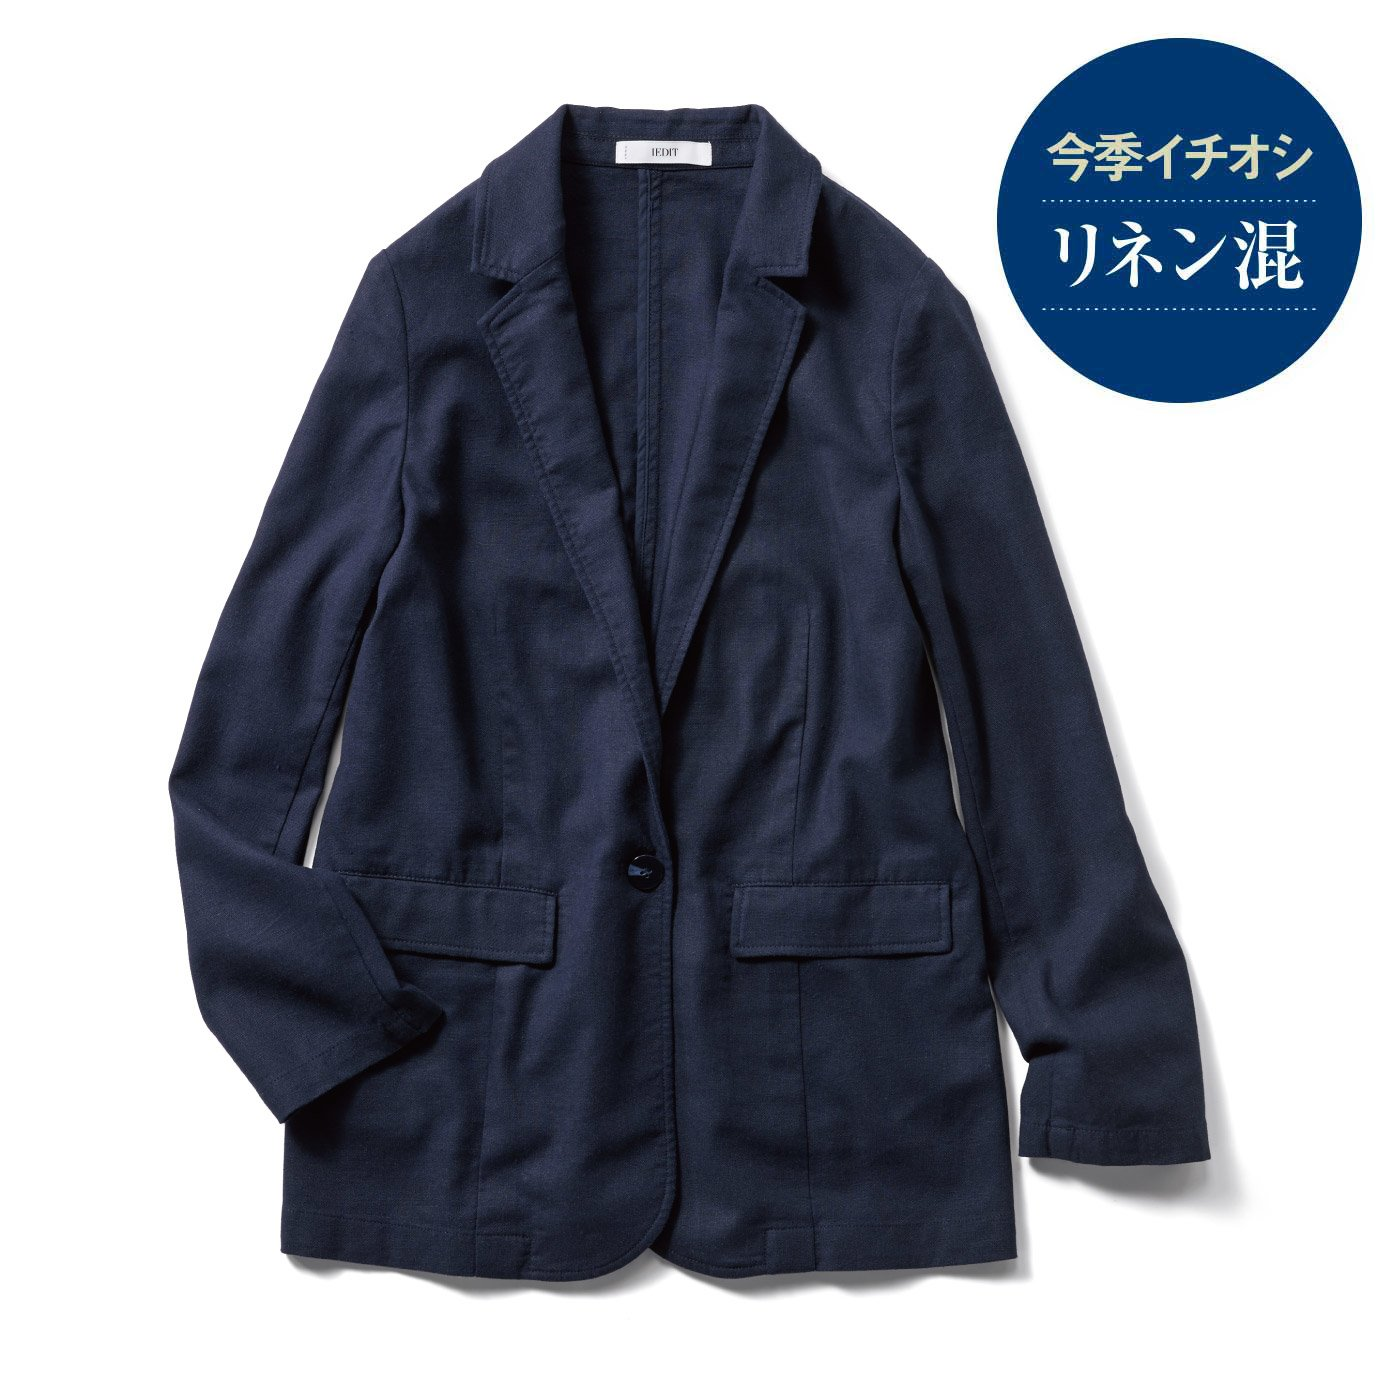 IEDIT[イディット] リネン混素材で上質にこなれる きれい見えジャケット〈ネイビー〉